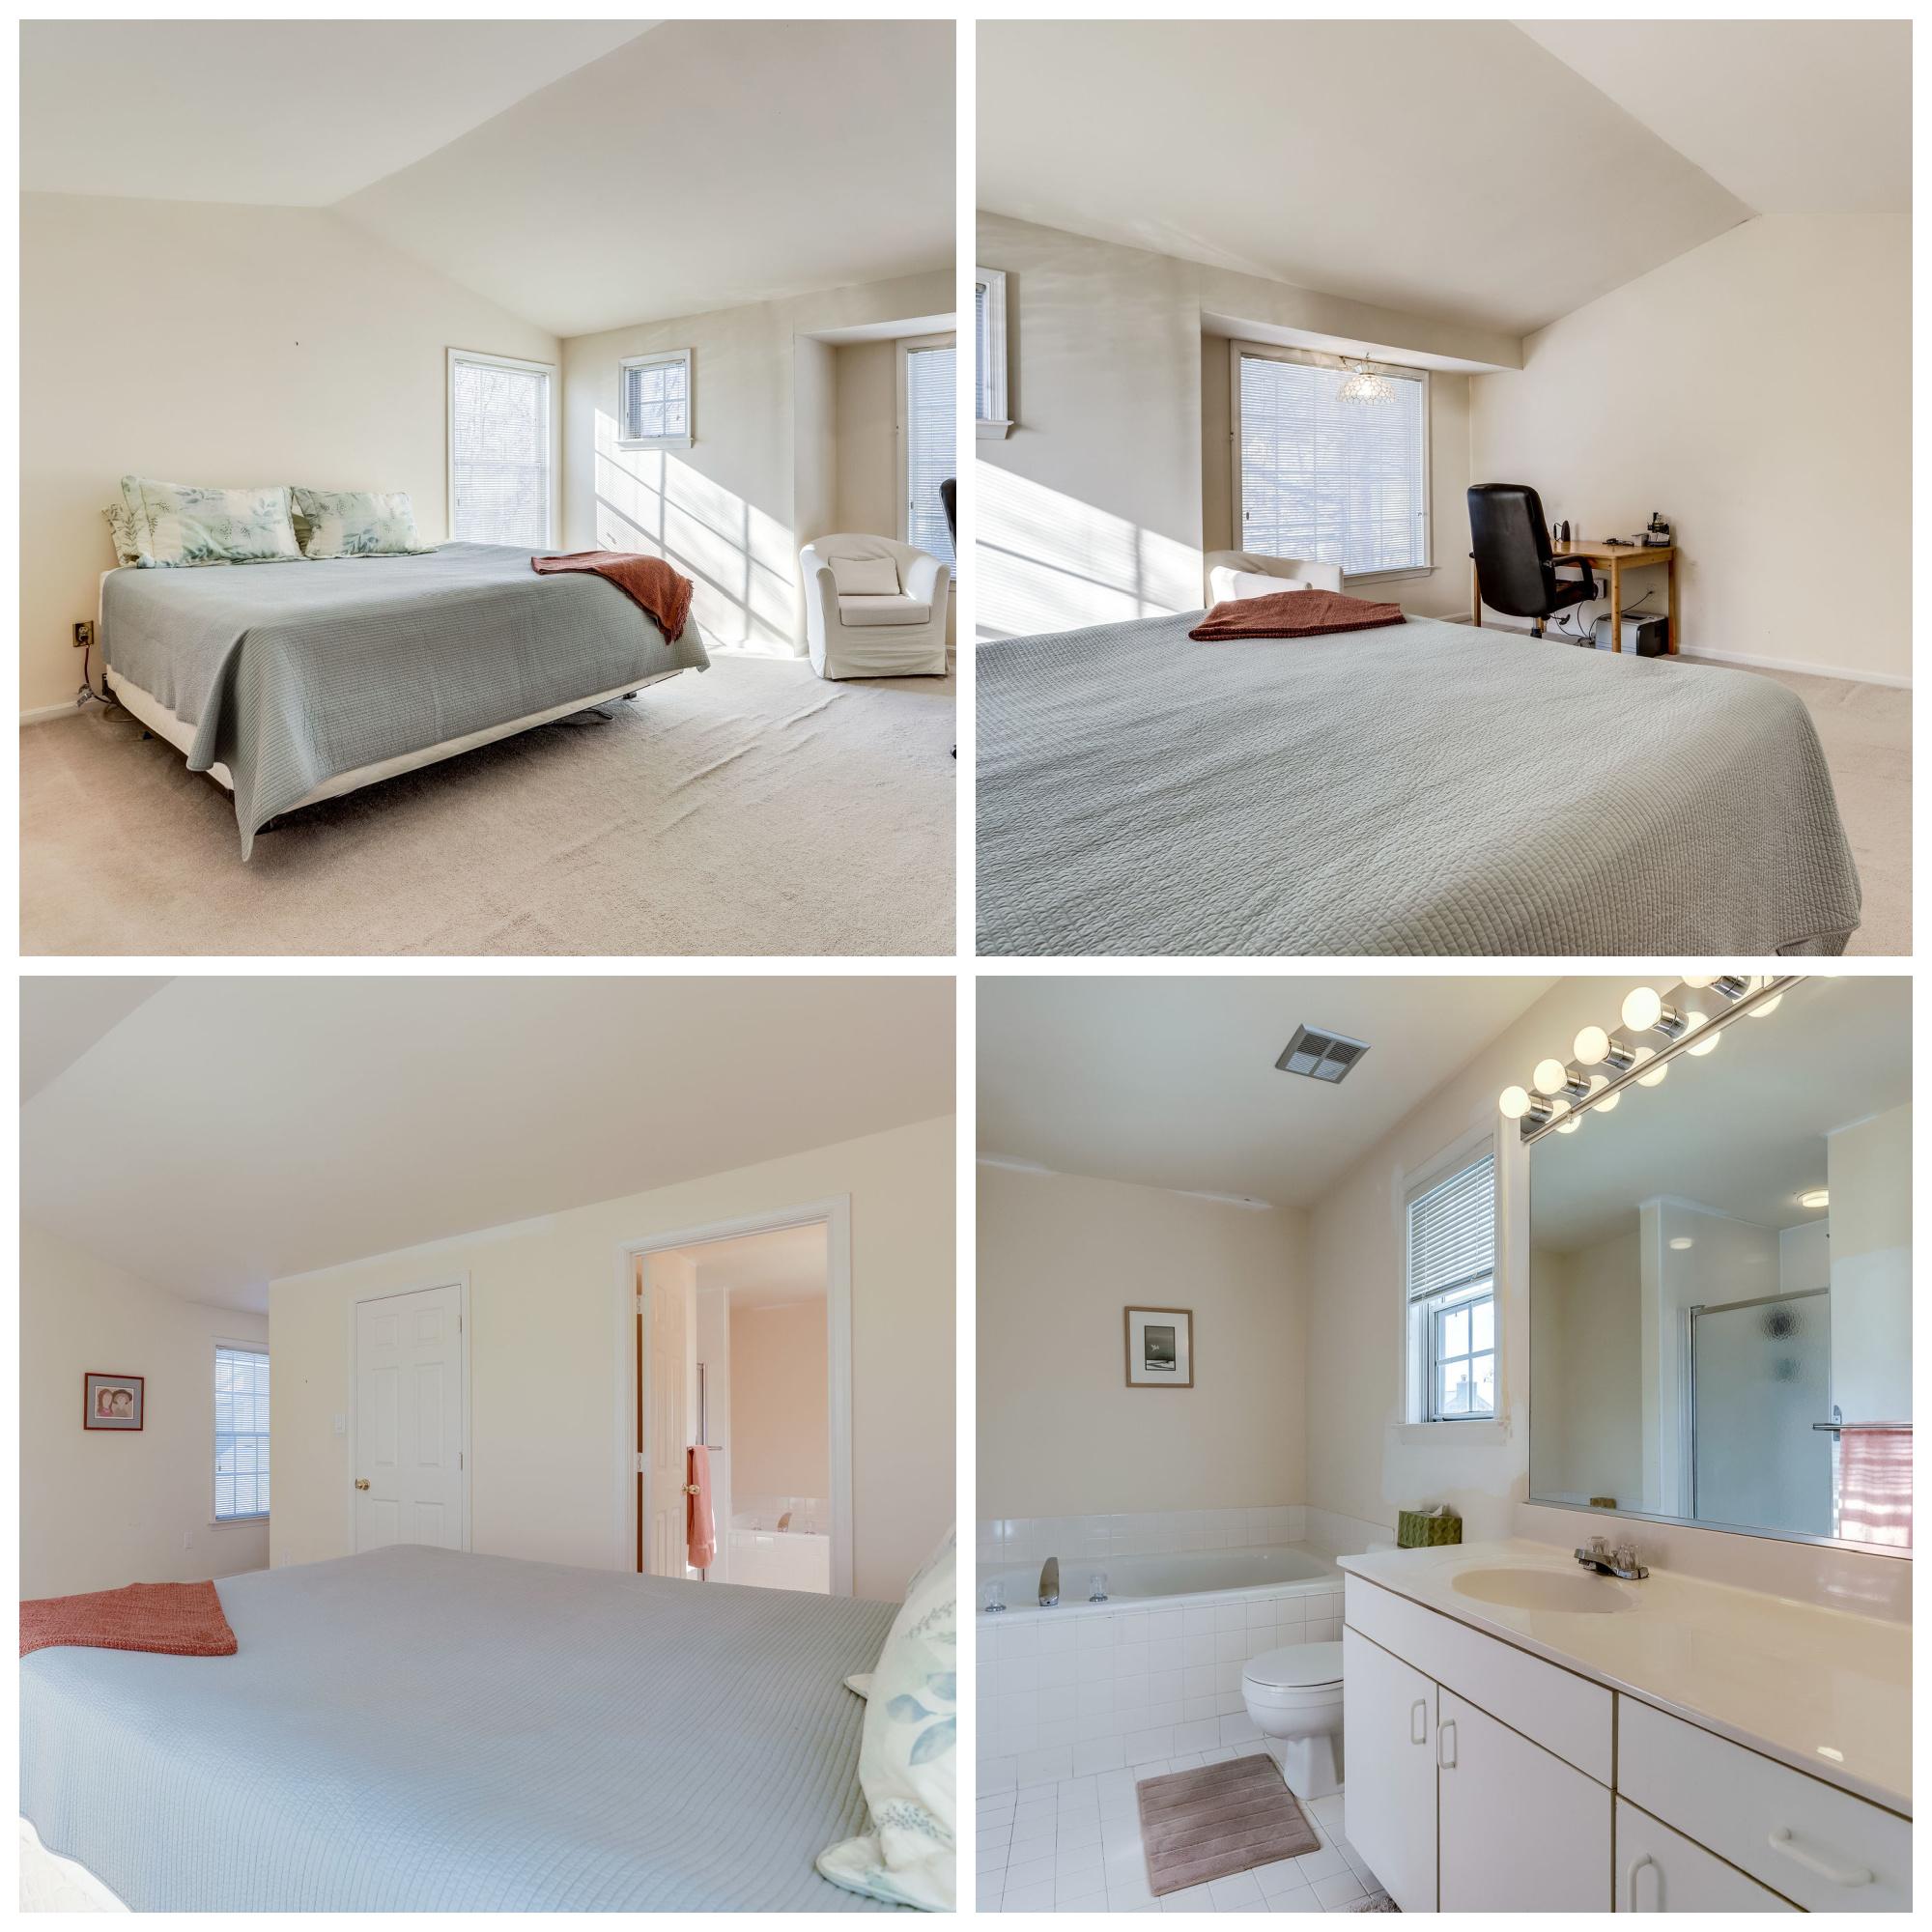 21114 Crocus Ter, Ashburn- Bedroom and Bath 1